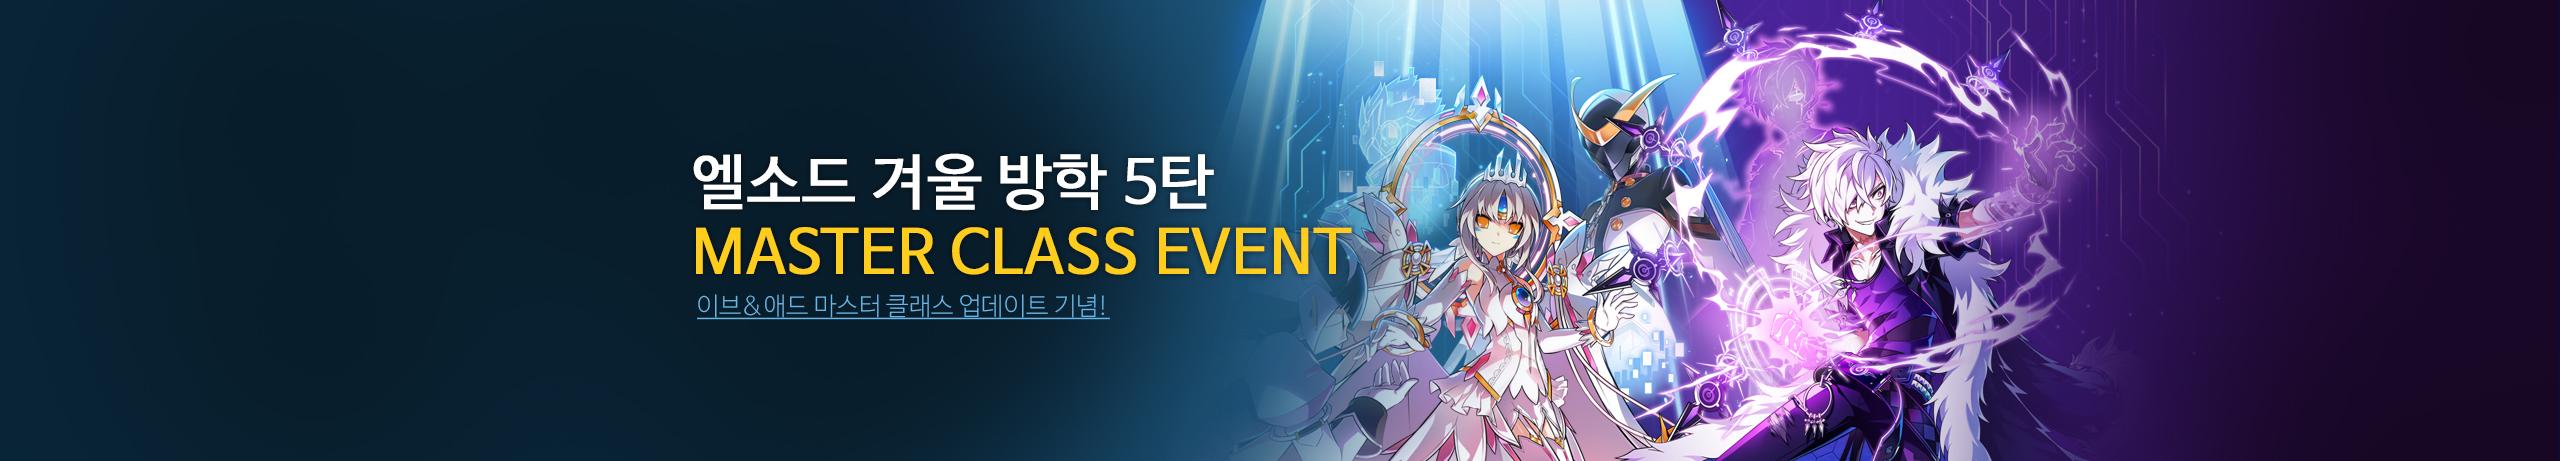 MASTER CLASS EVENT - 5차